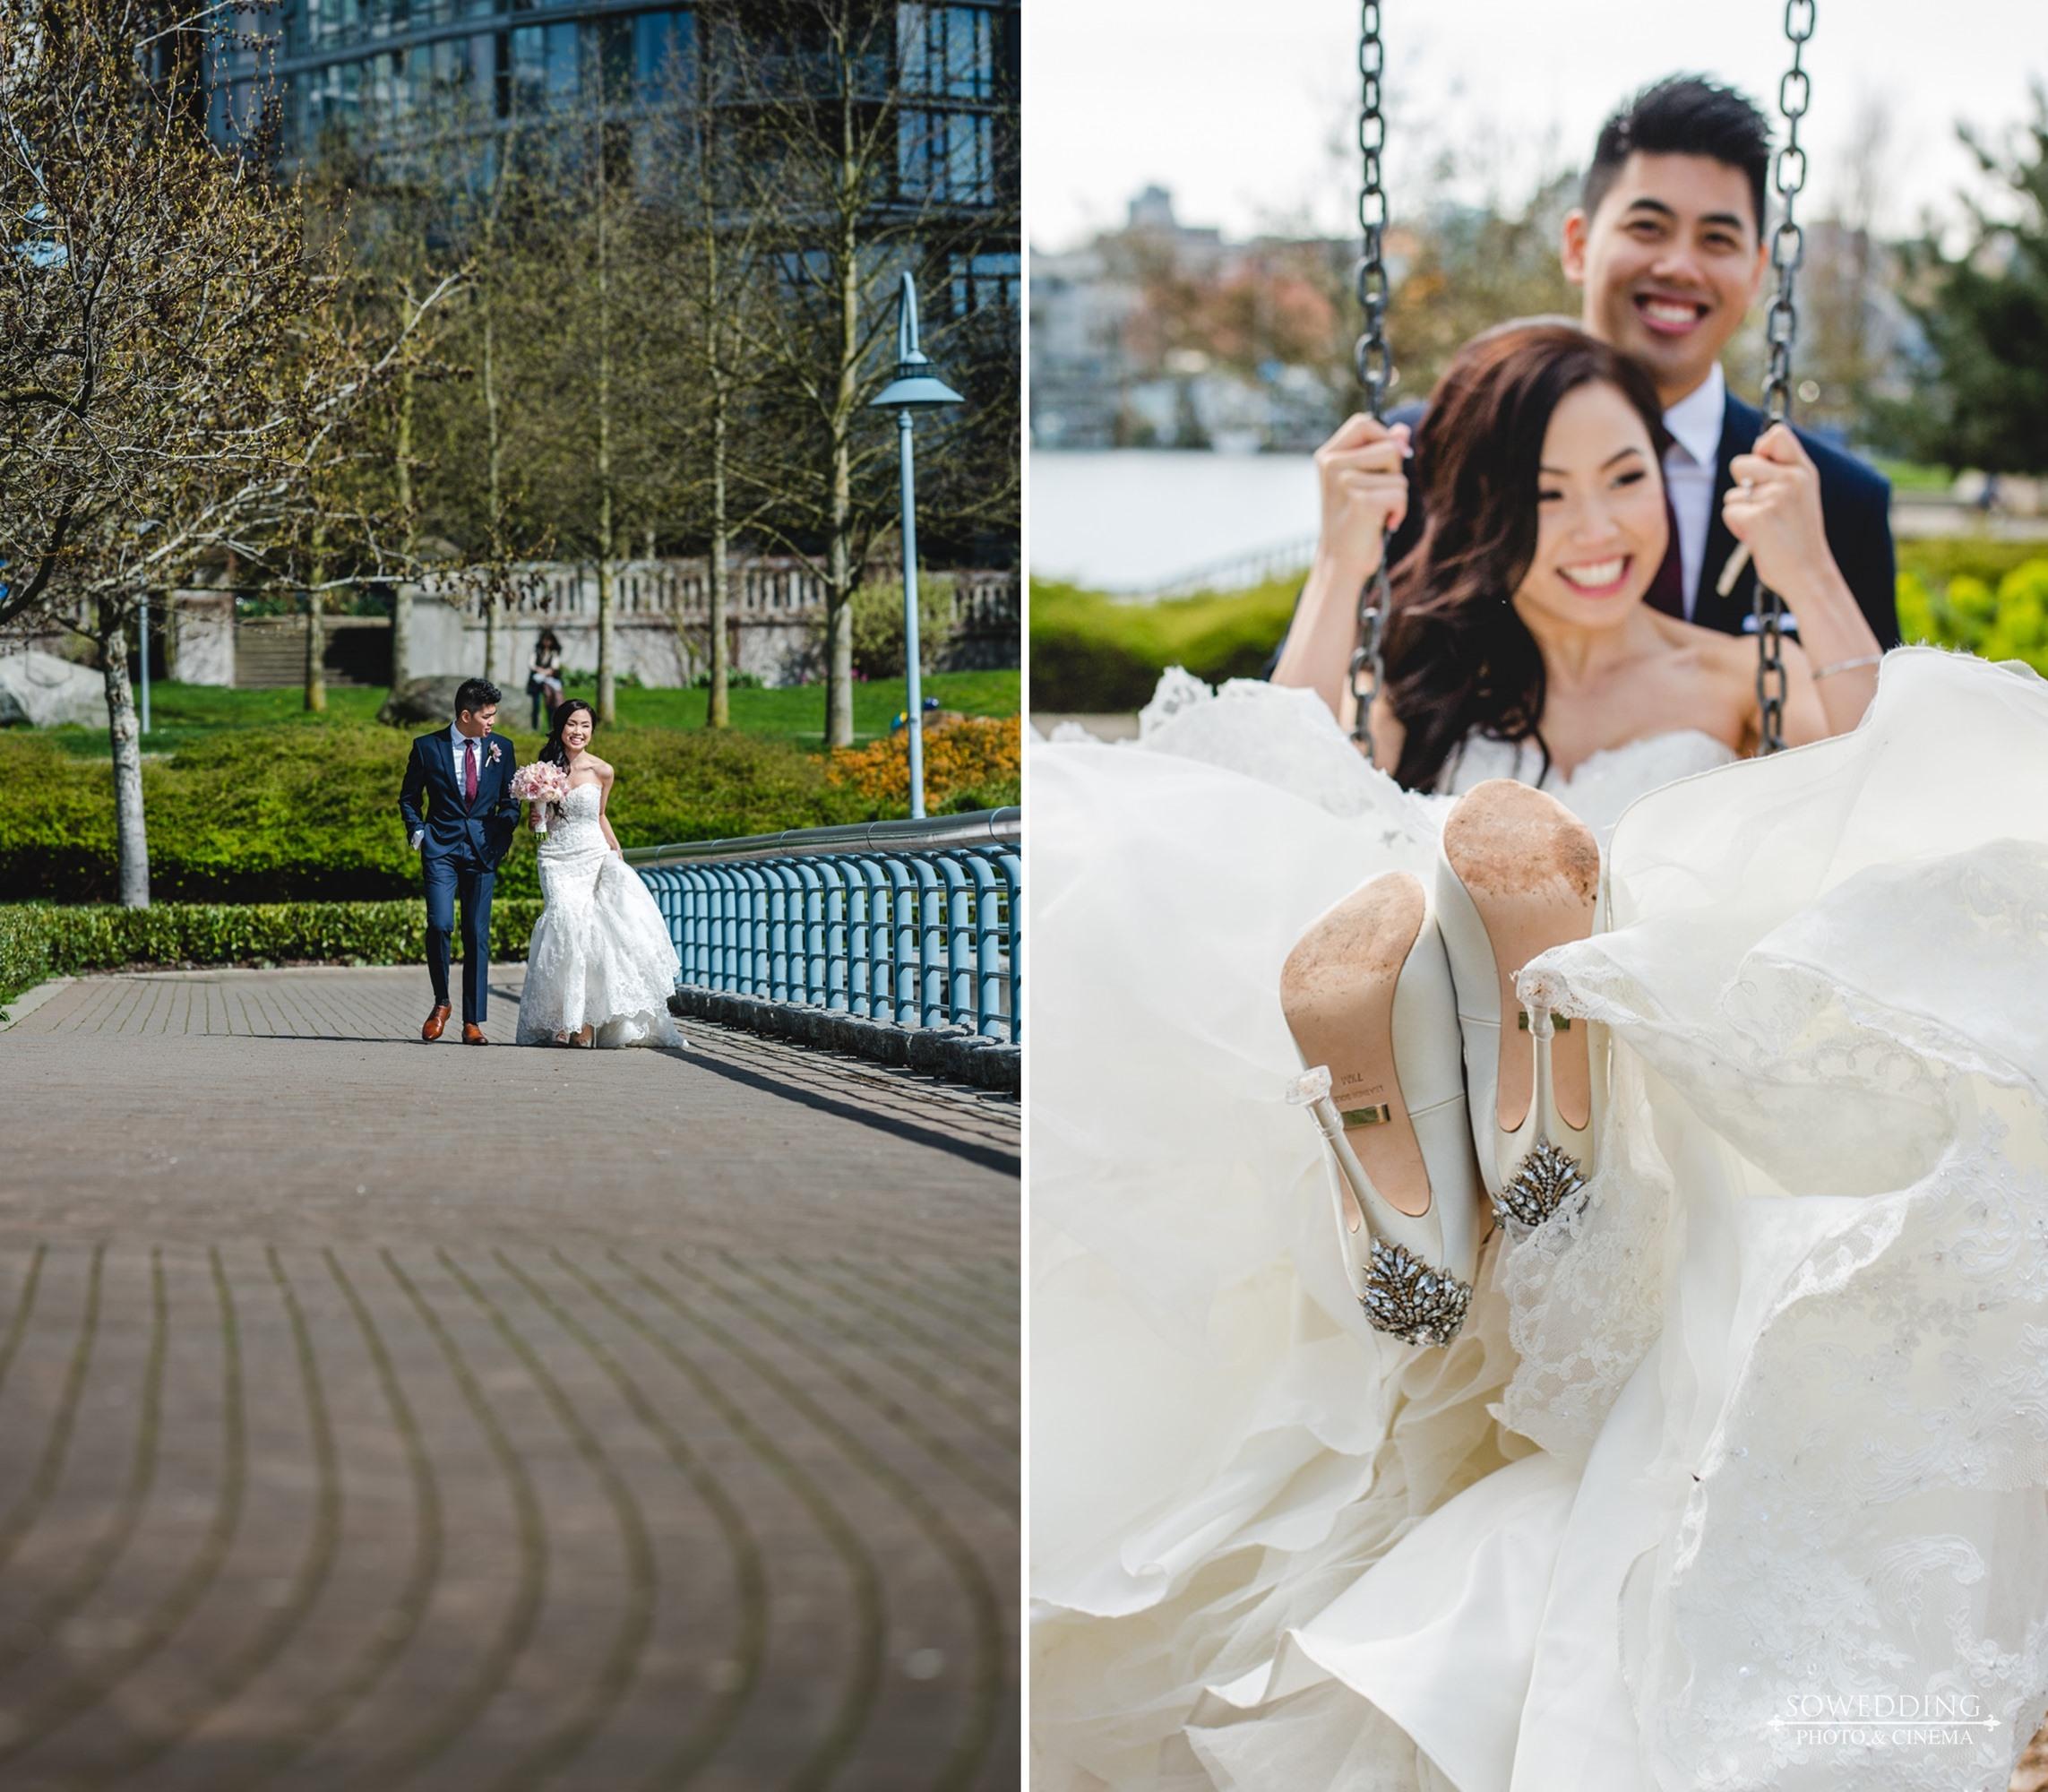 2016Mar26-Priscilla&Michael-wedding-HL-SD-0098